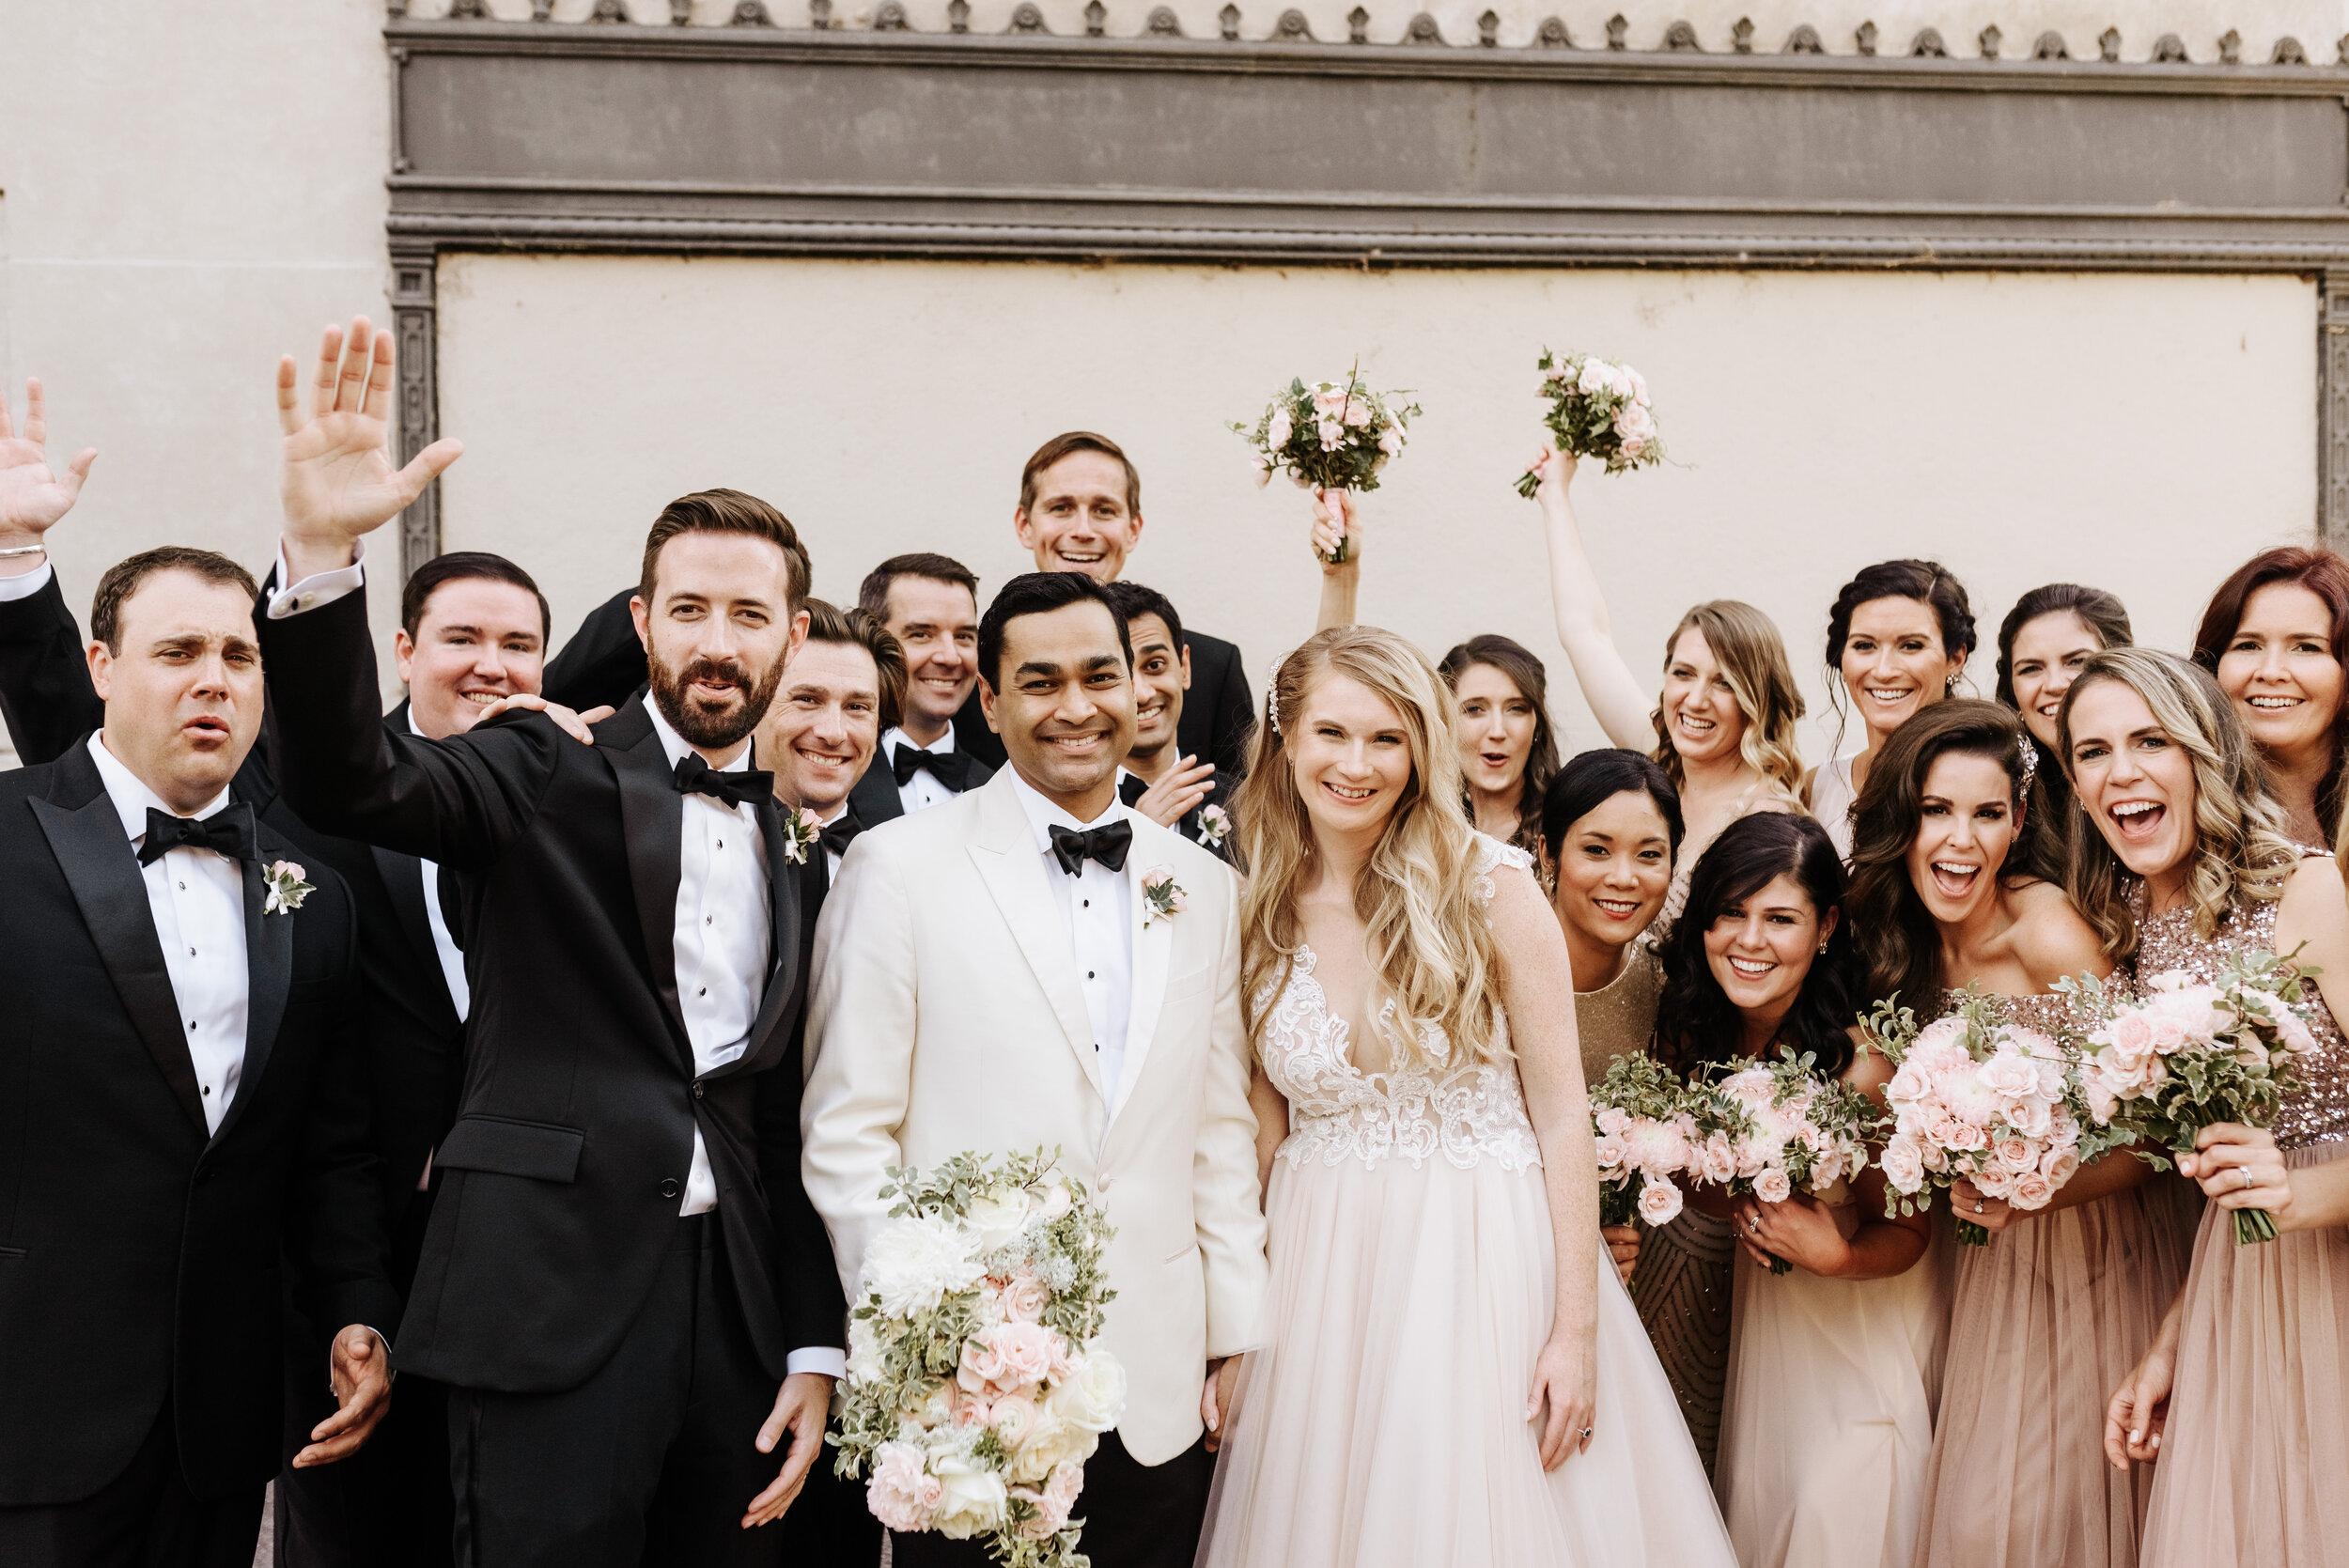 Cassie-Mrunal-Wedding-Quirk-Hotel-John-Marshall-Ballrooms-Richmond-Virginia-Photography-by-V-57.jpg